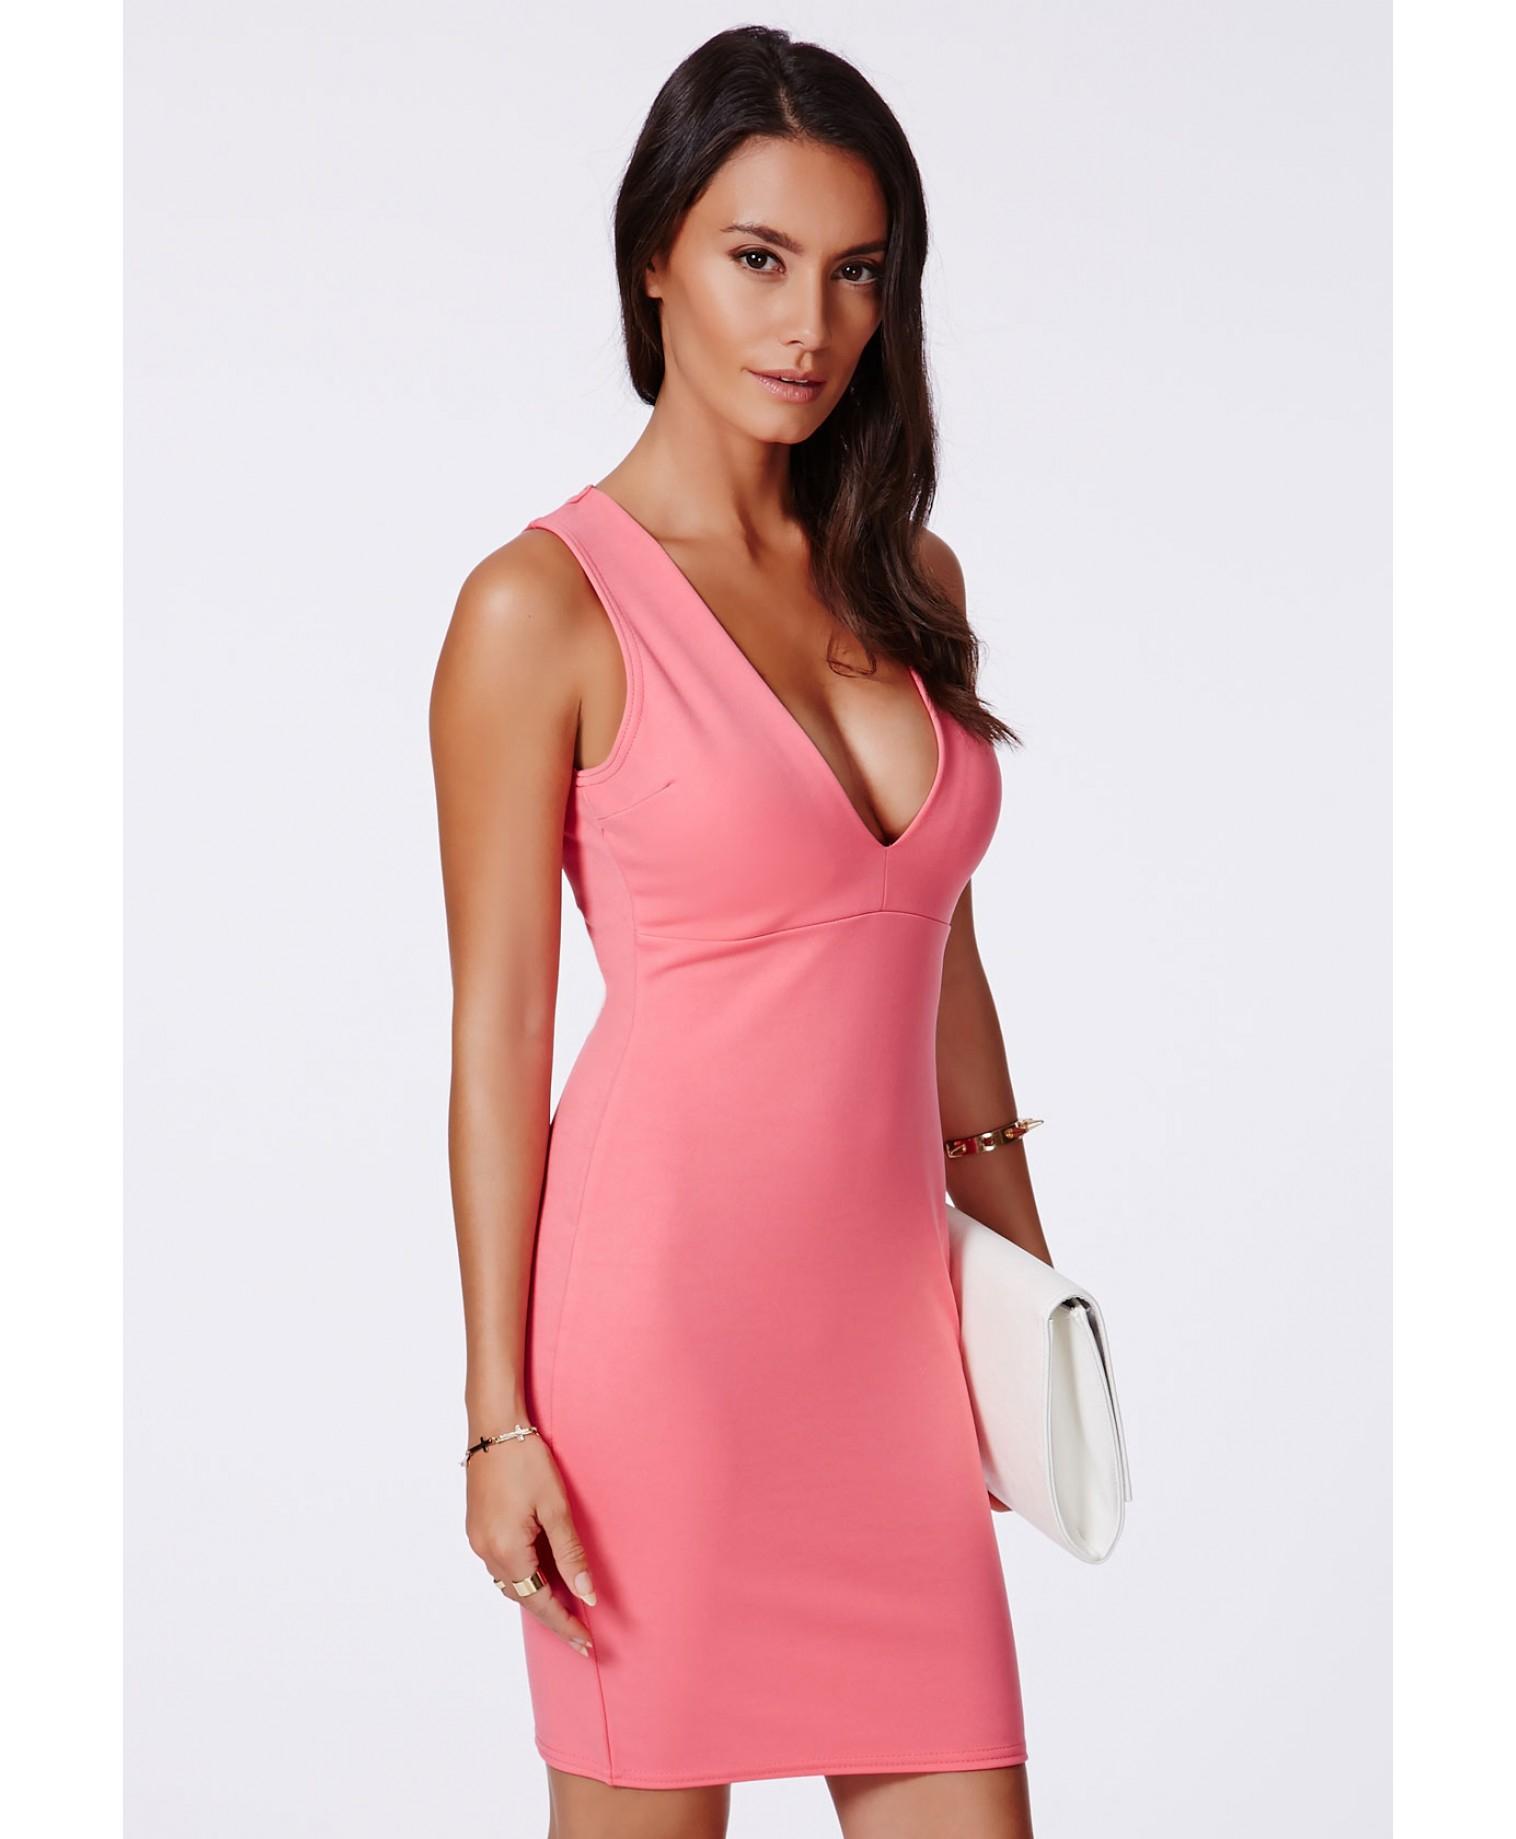 b056f2cea78f Lyst - Missguided Kesari Coral Plunge Neck Bodycon Mini Dress in Pink